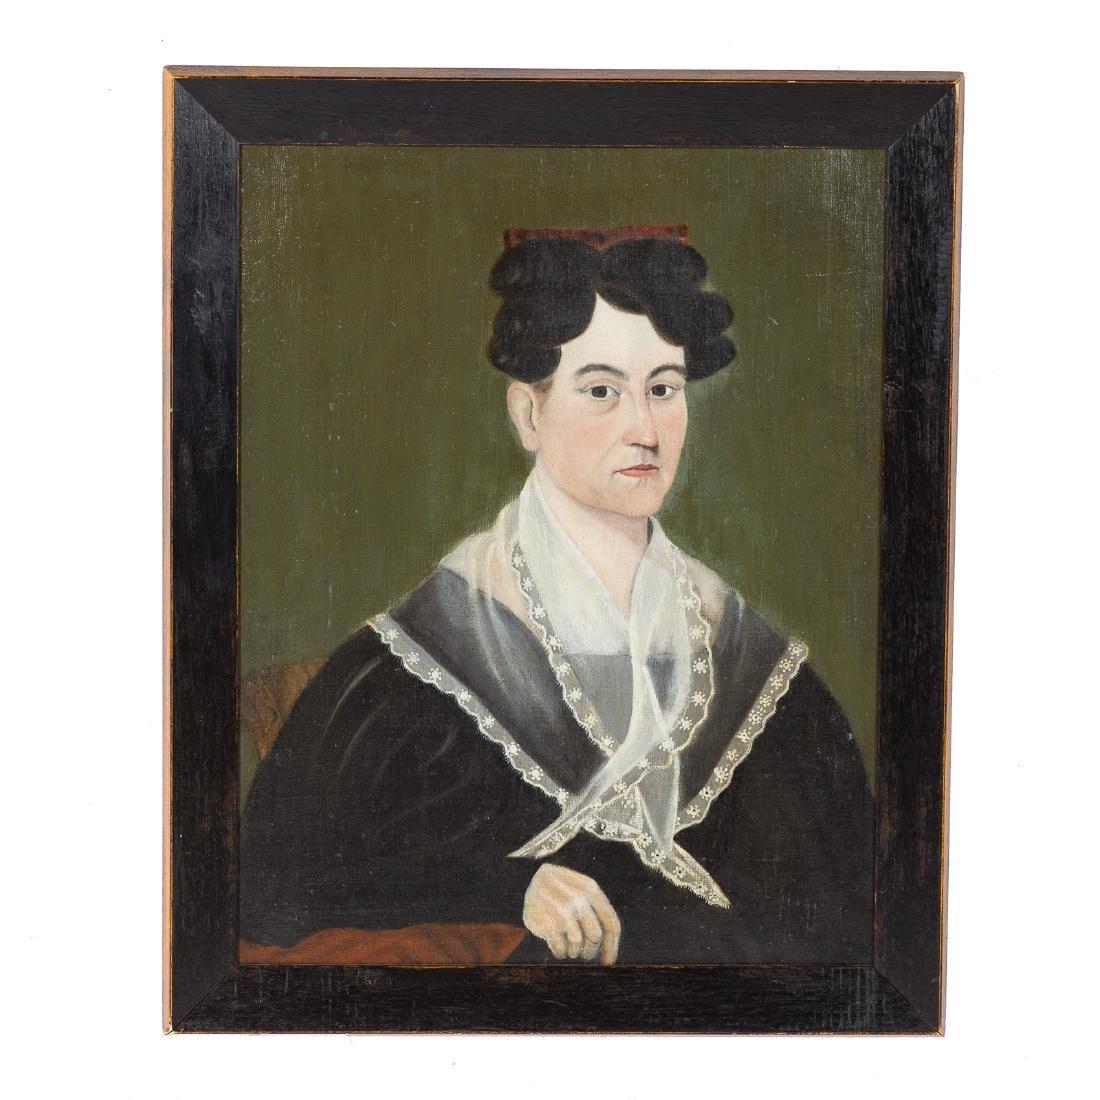 American School, 19th c. Portrait of a Woman, oil